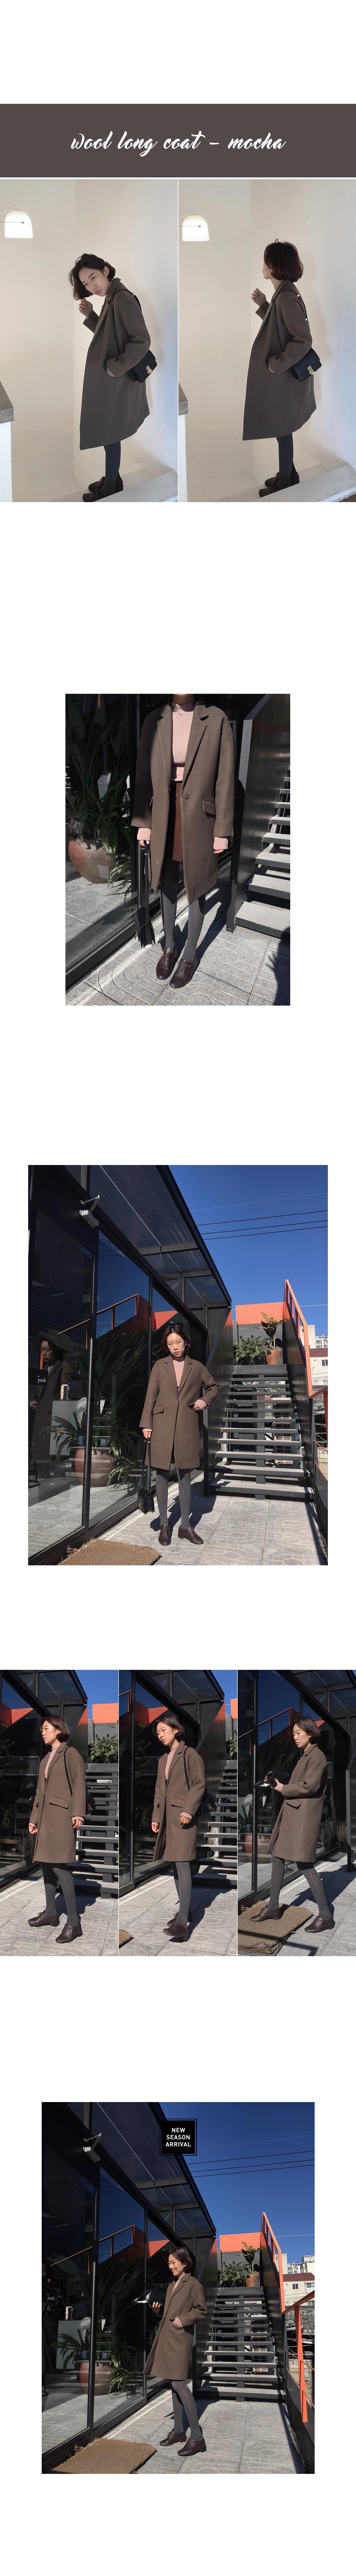 (ZEM.made) 단아핏-울코트 (울90%,mocha)